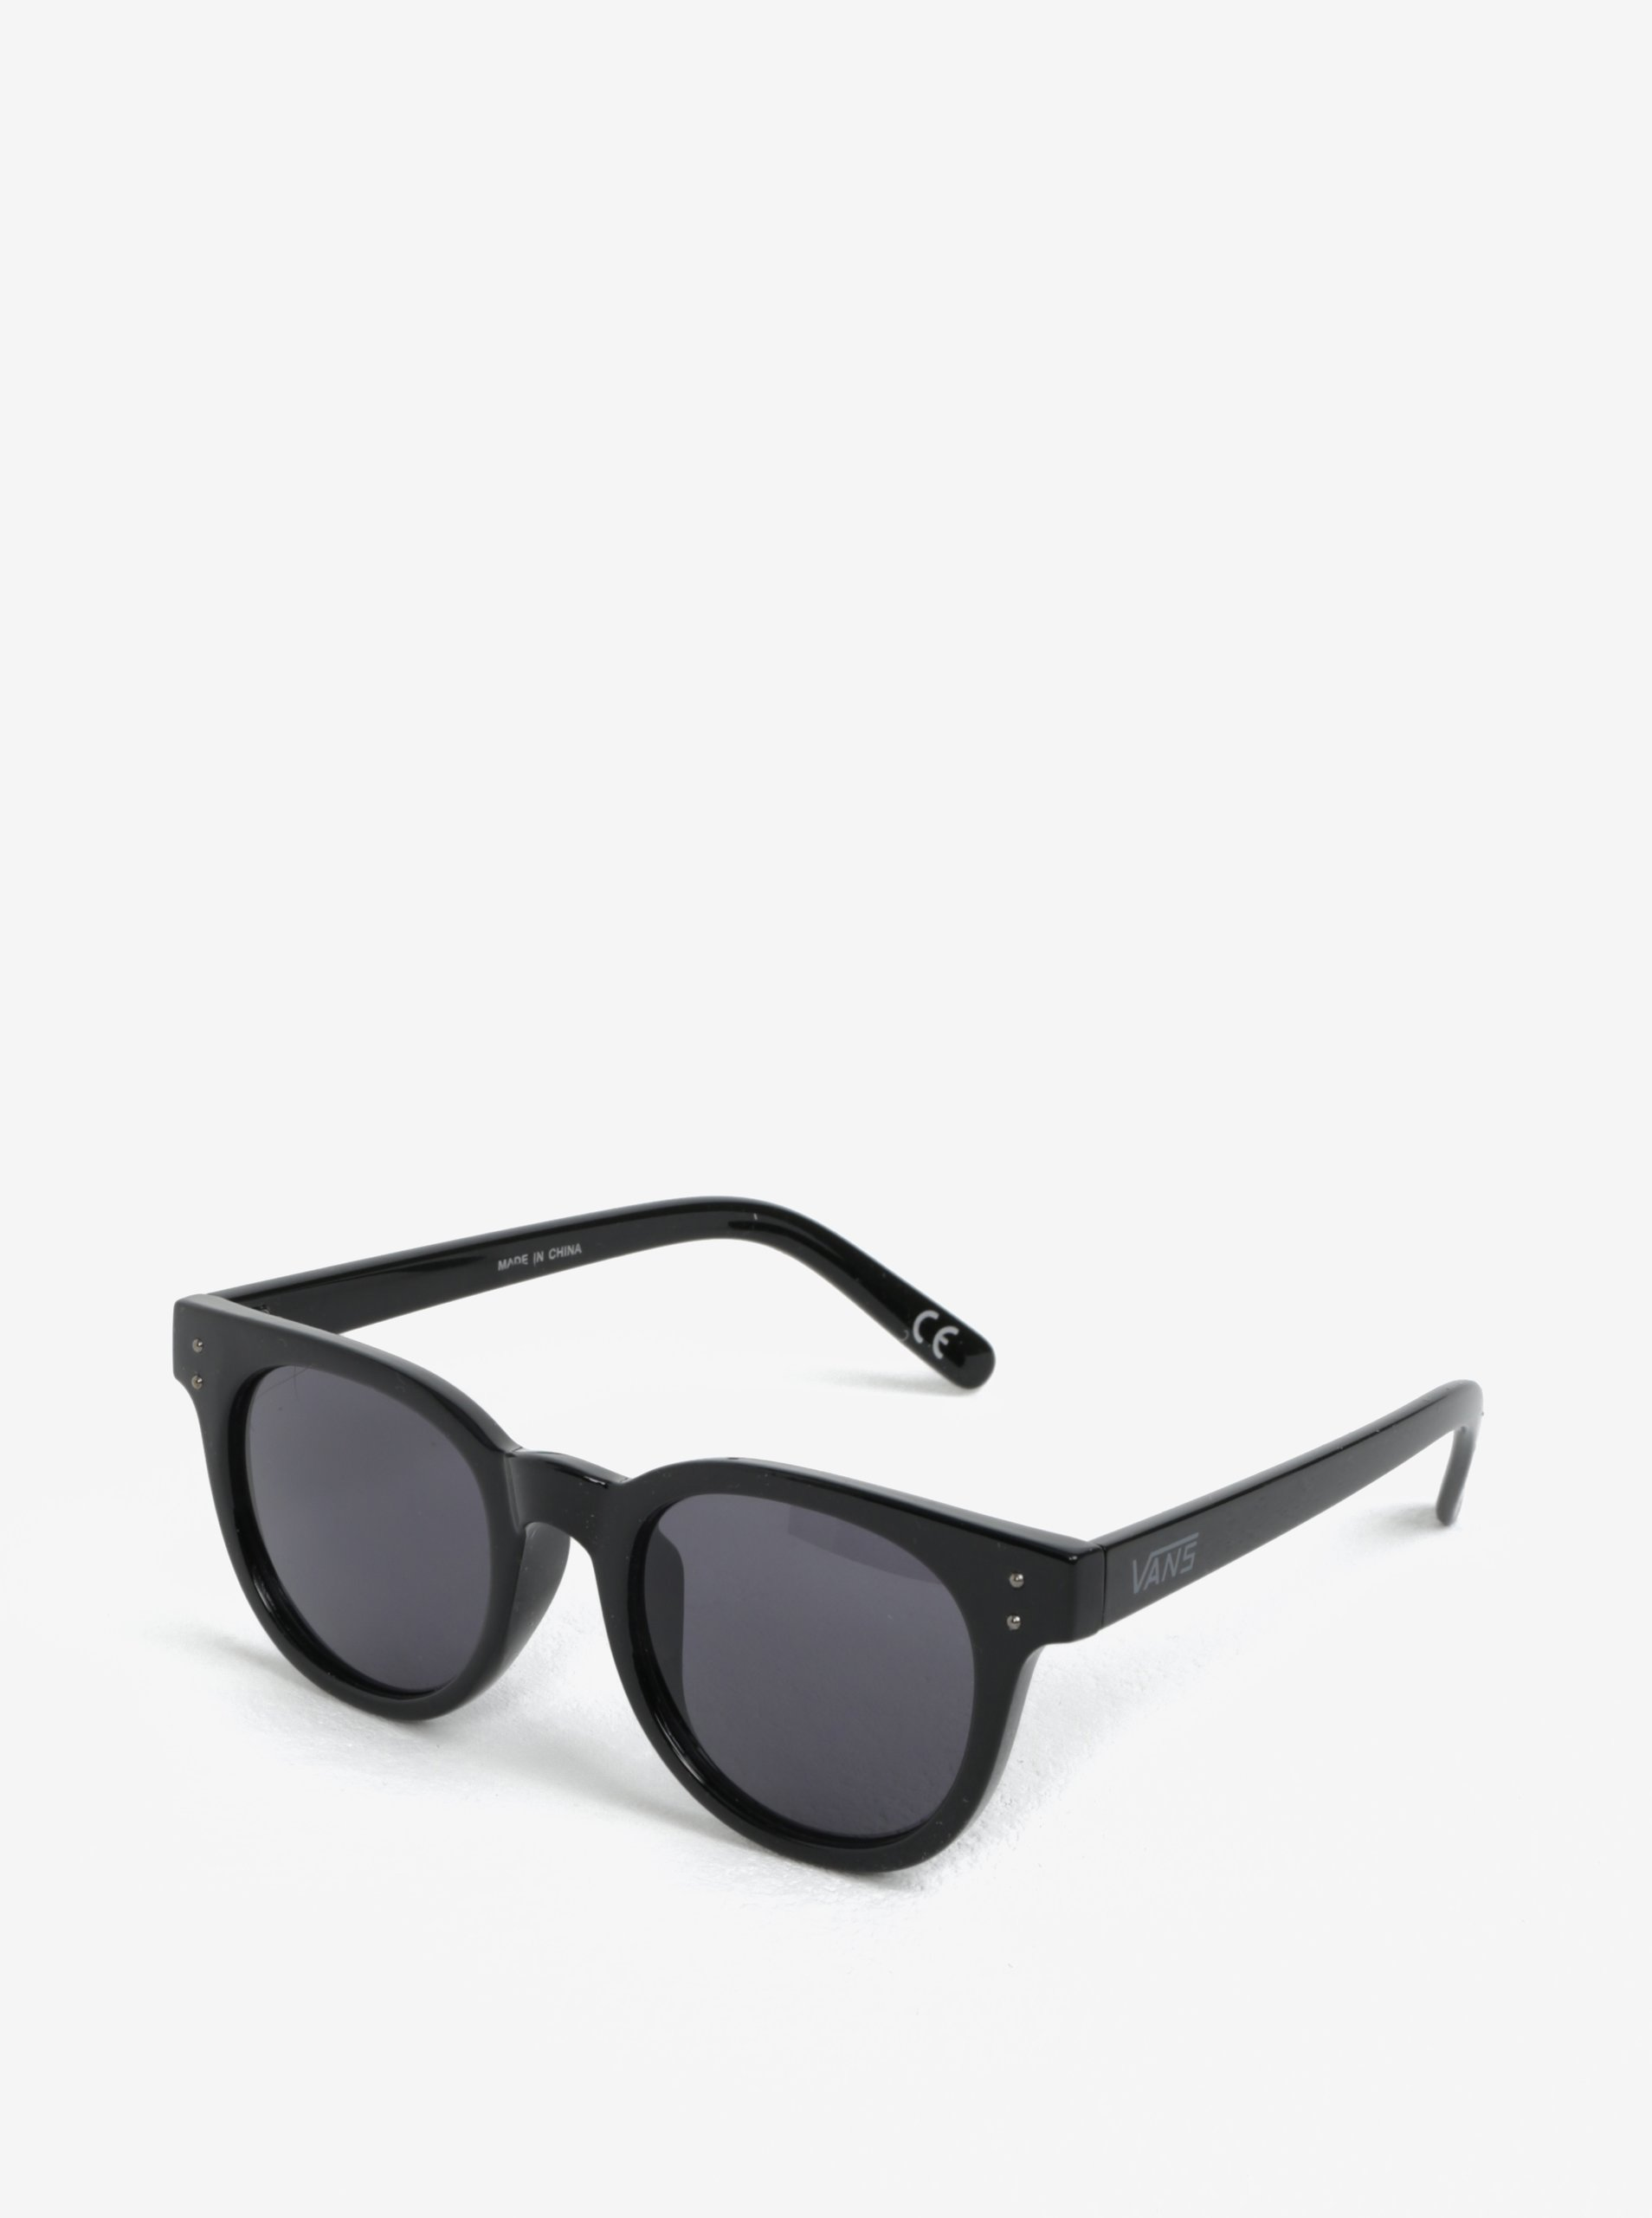 Čierne pánske slnečné okuliare VANS Welborn  f5fc3fae94b